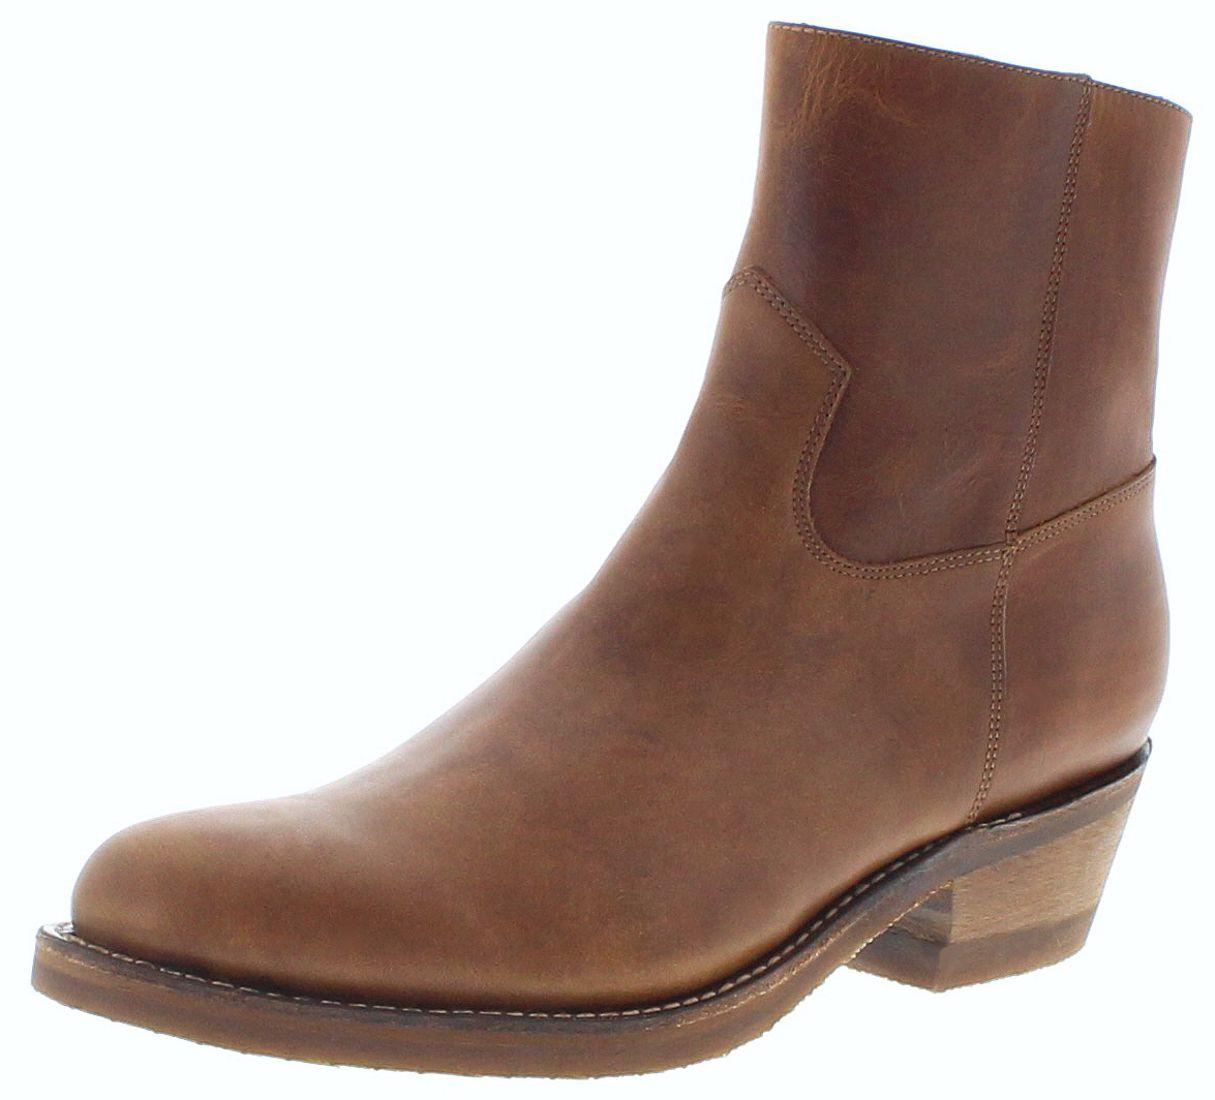 Sendra Boots 4984 Rastro Men Western Bootee - brown